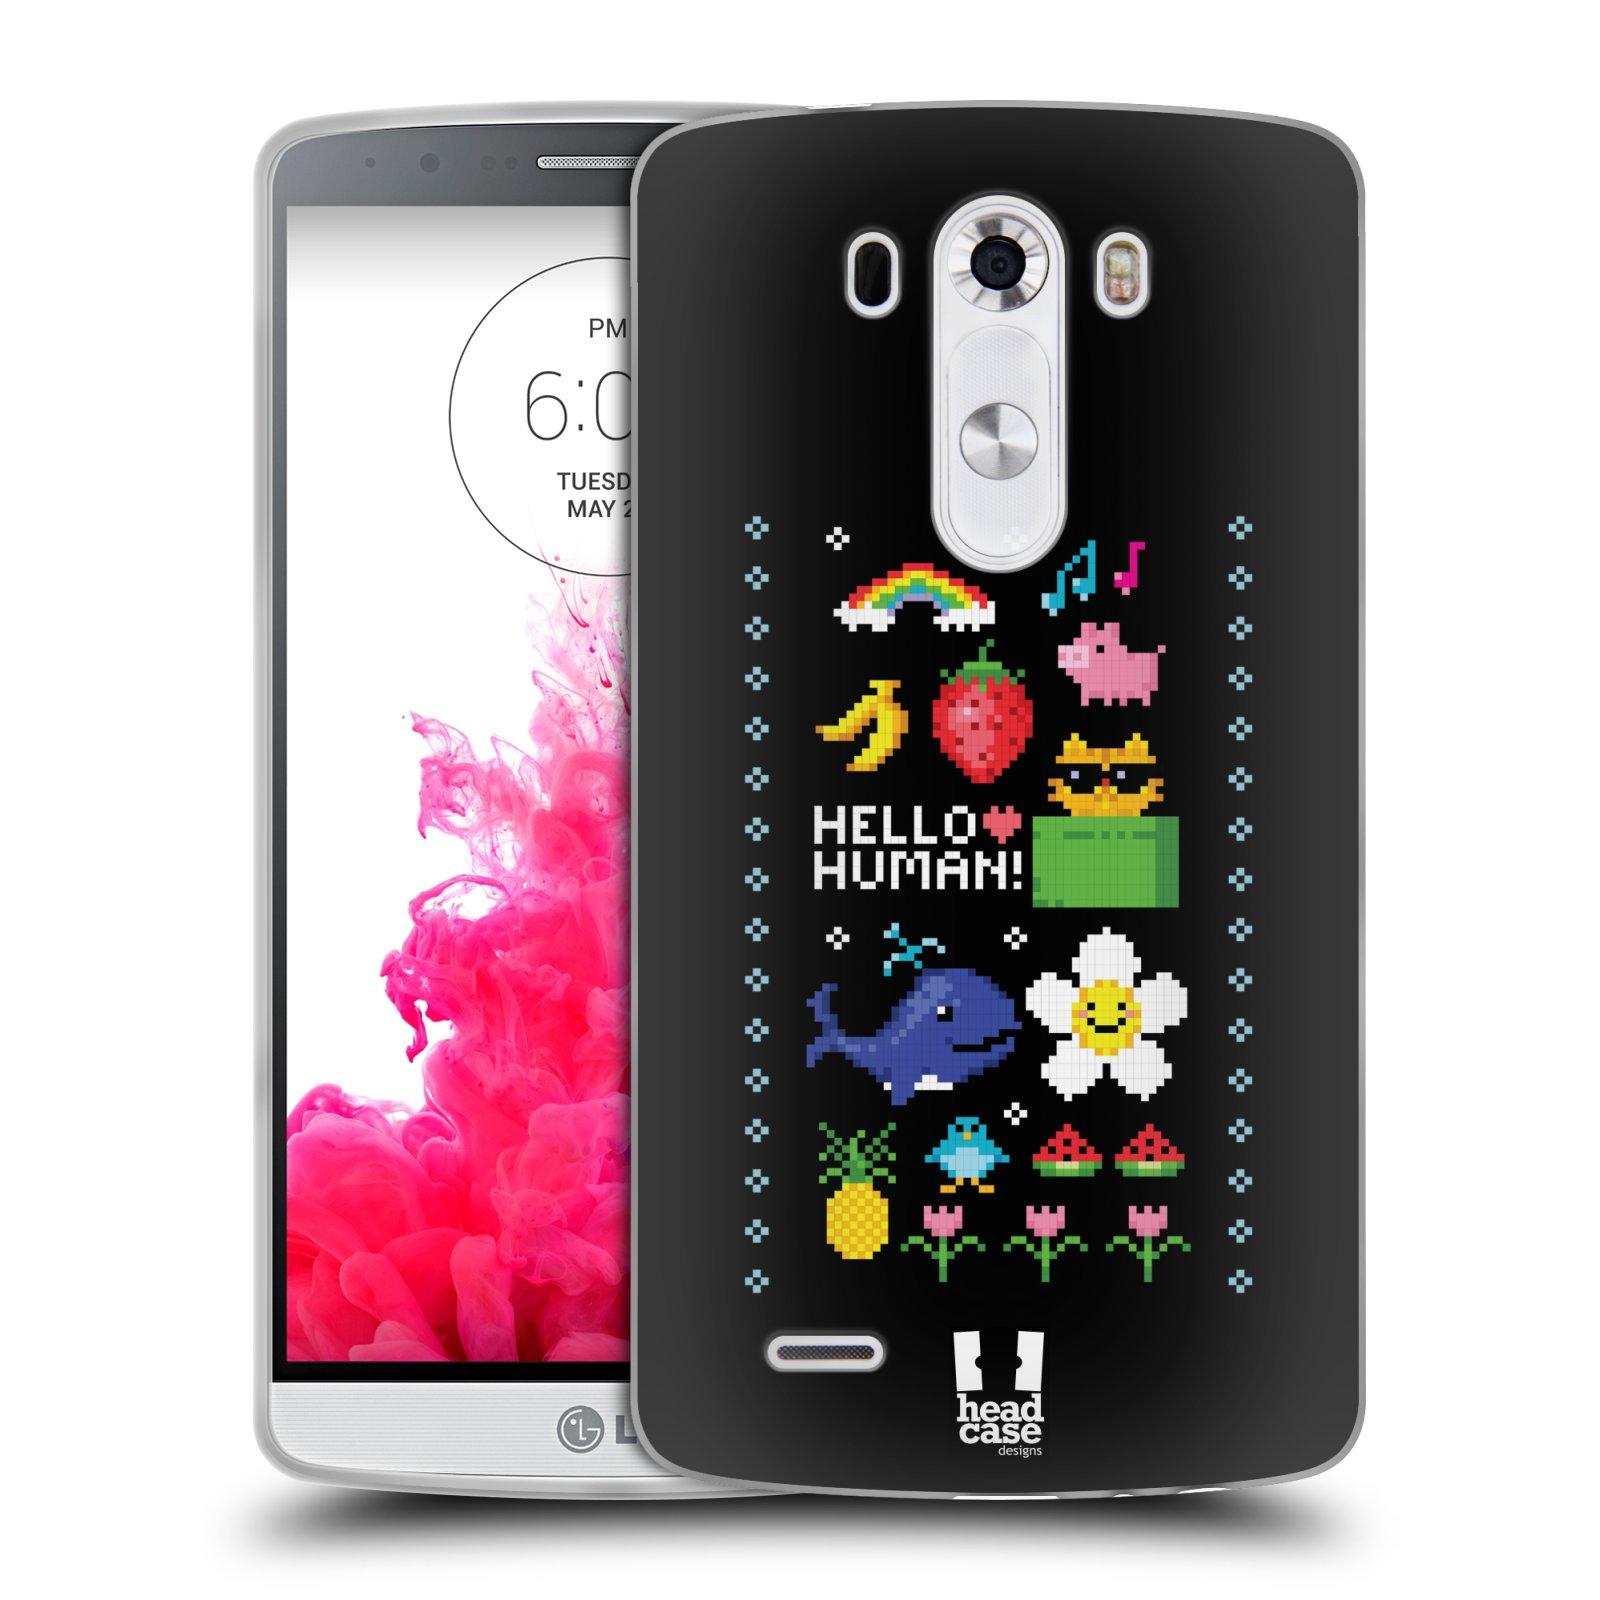 HEAD CASE DESIGNS POP TRENDS SOFT GEL CASE FOR LG PHONES 1